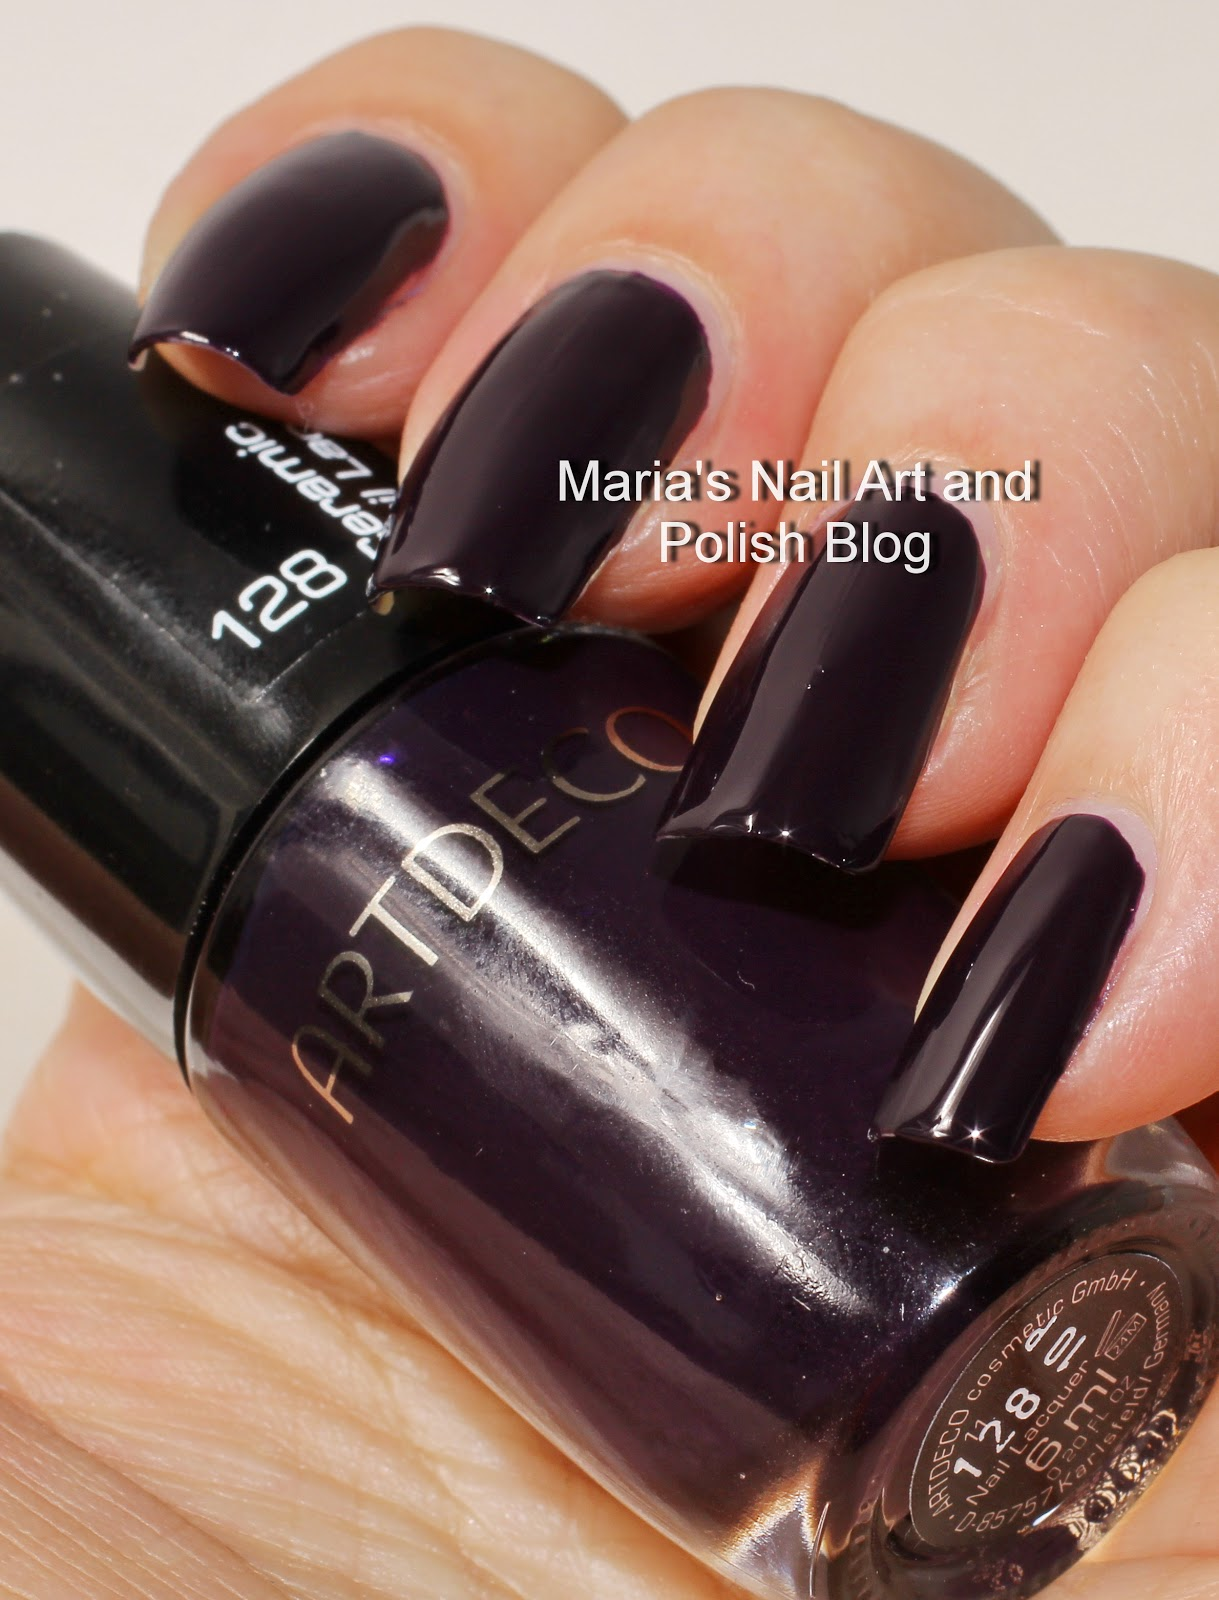 Marias Nail Art and Polish Blog: Artdeco 081 and 128 swatches